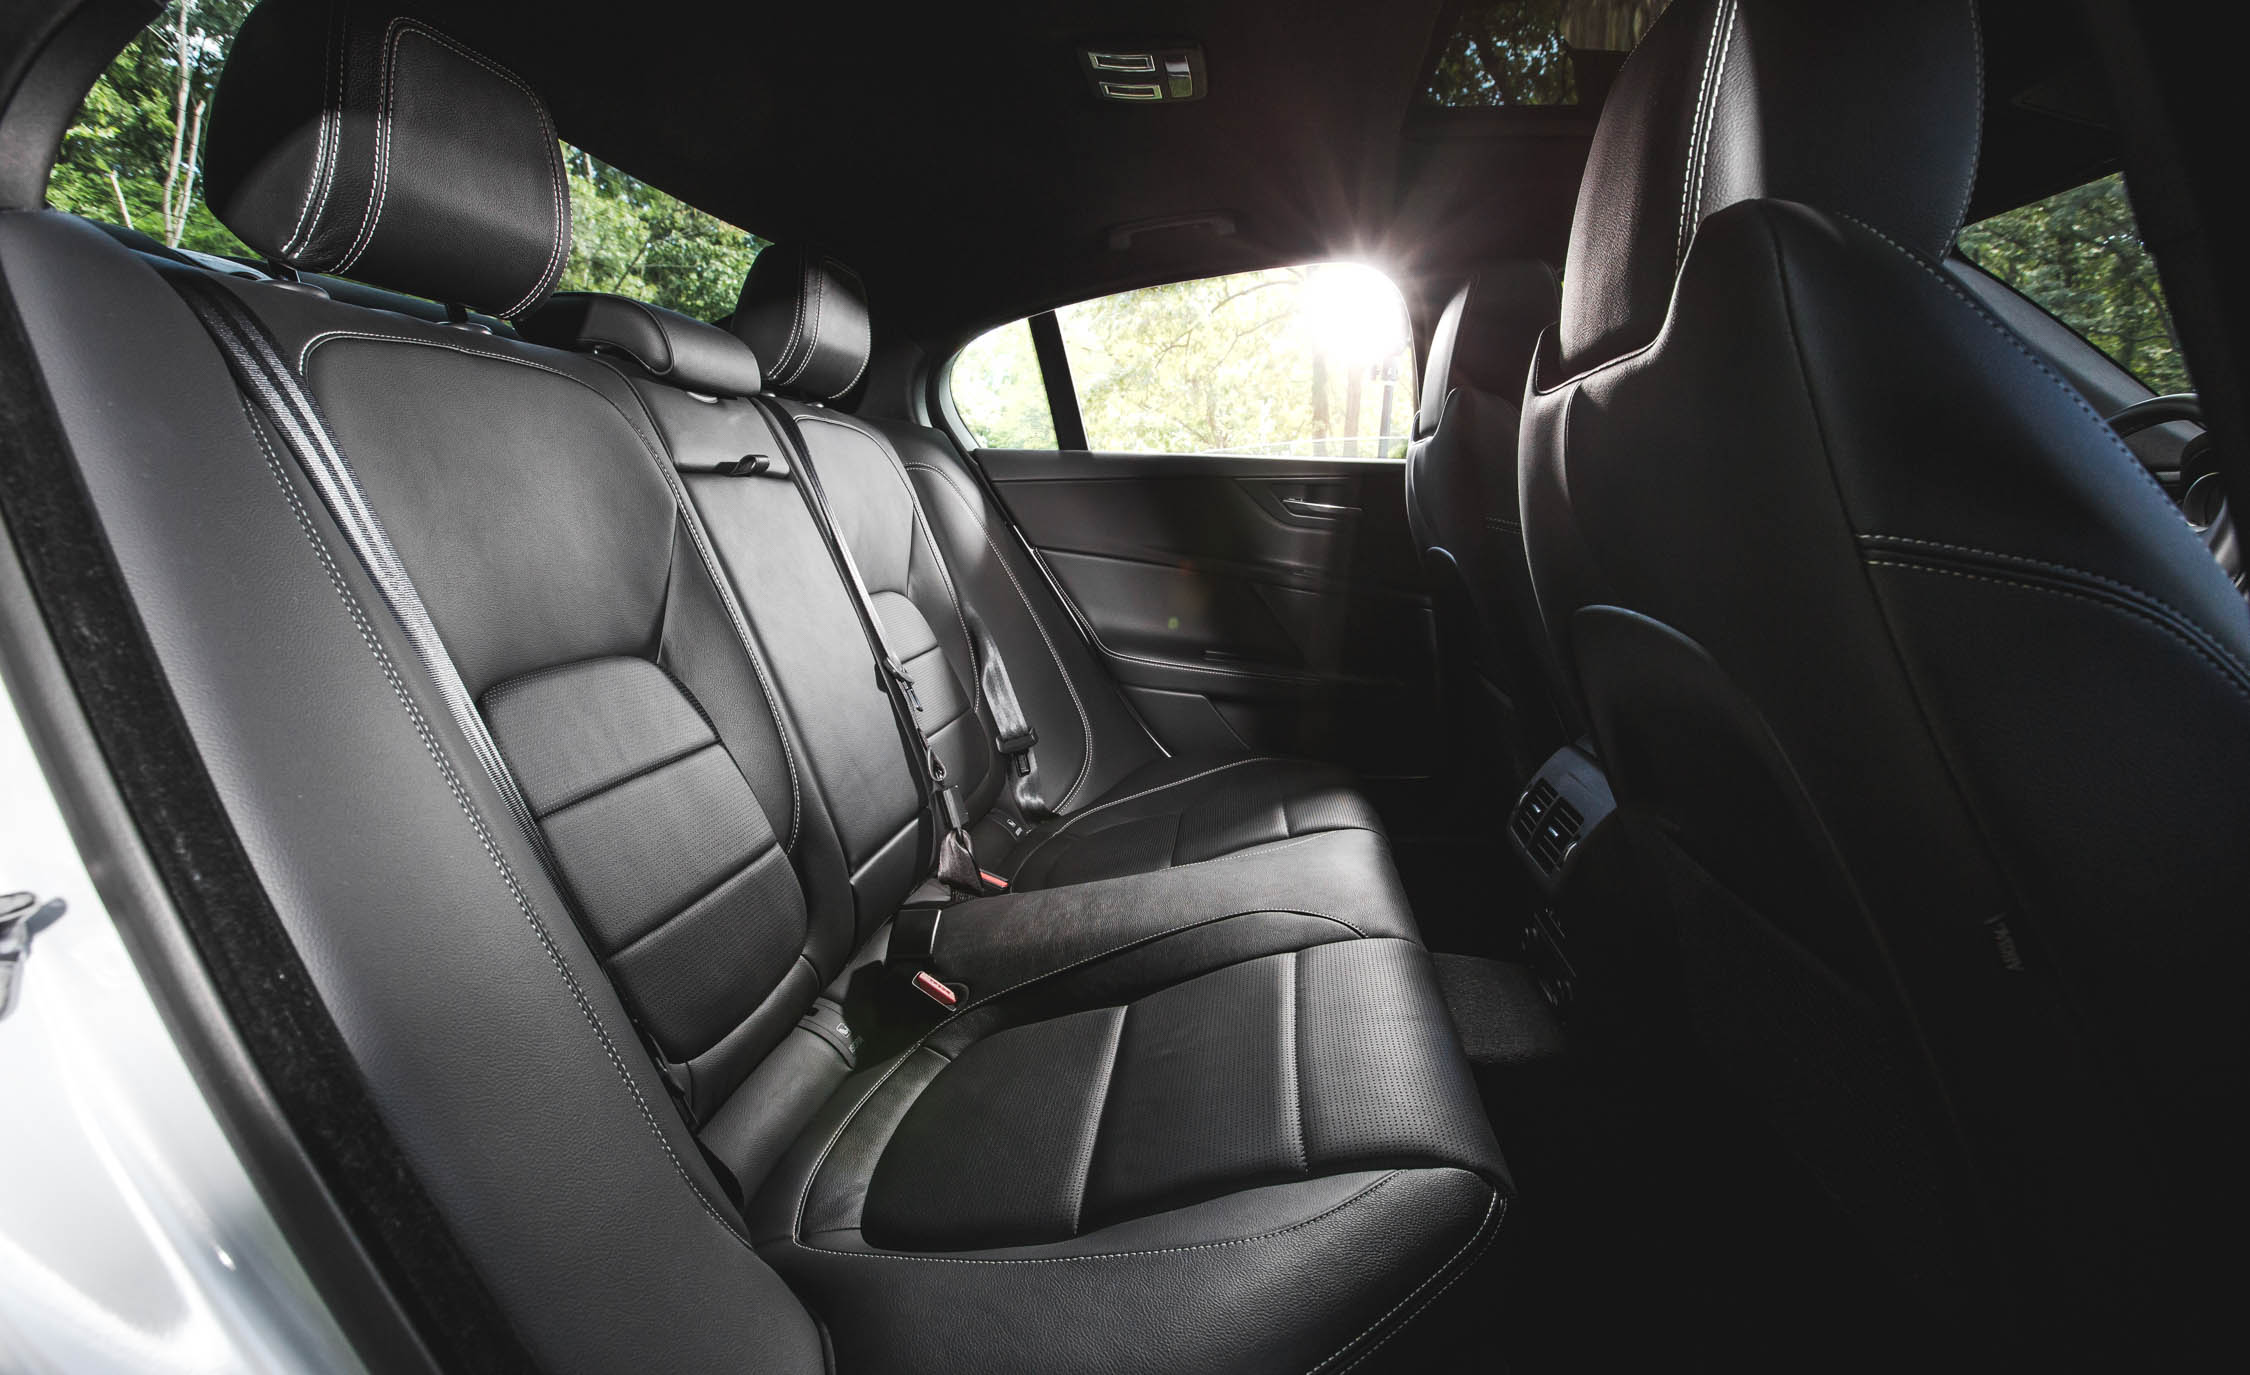 2017 Jaguar Xe Interior Seats Rear Passengers (View 16 of 32)